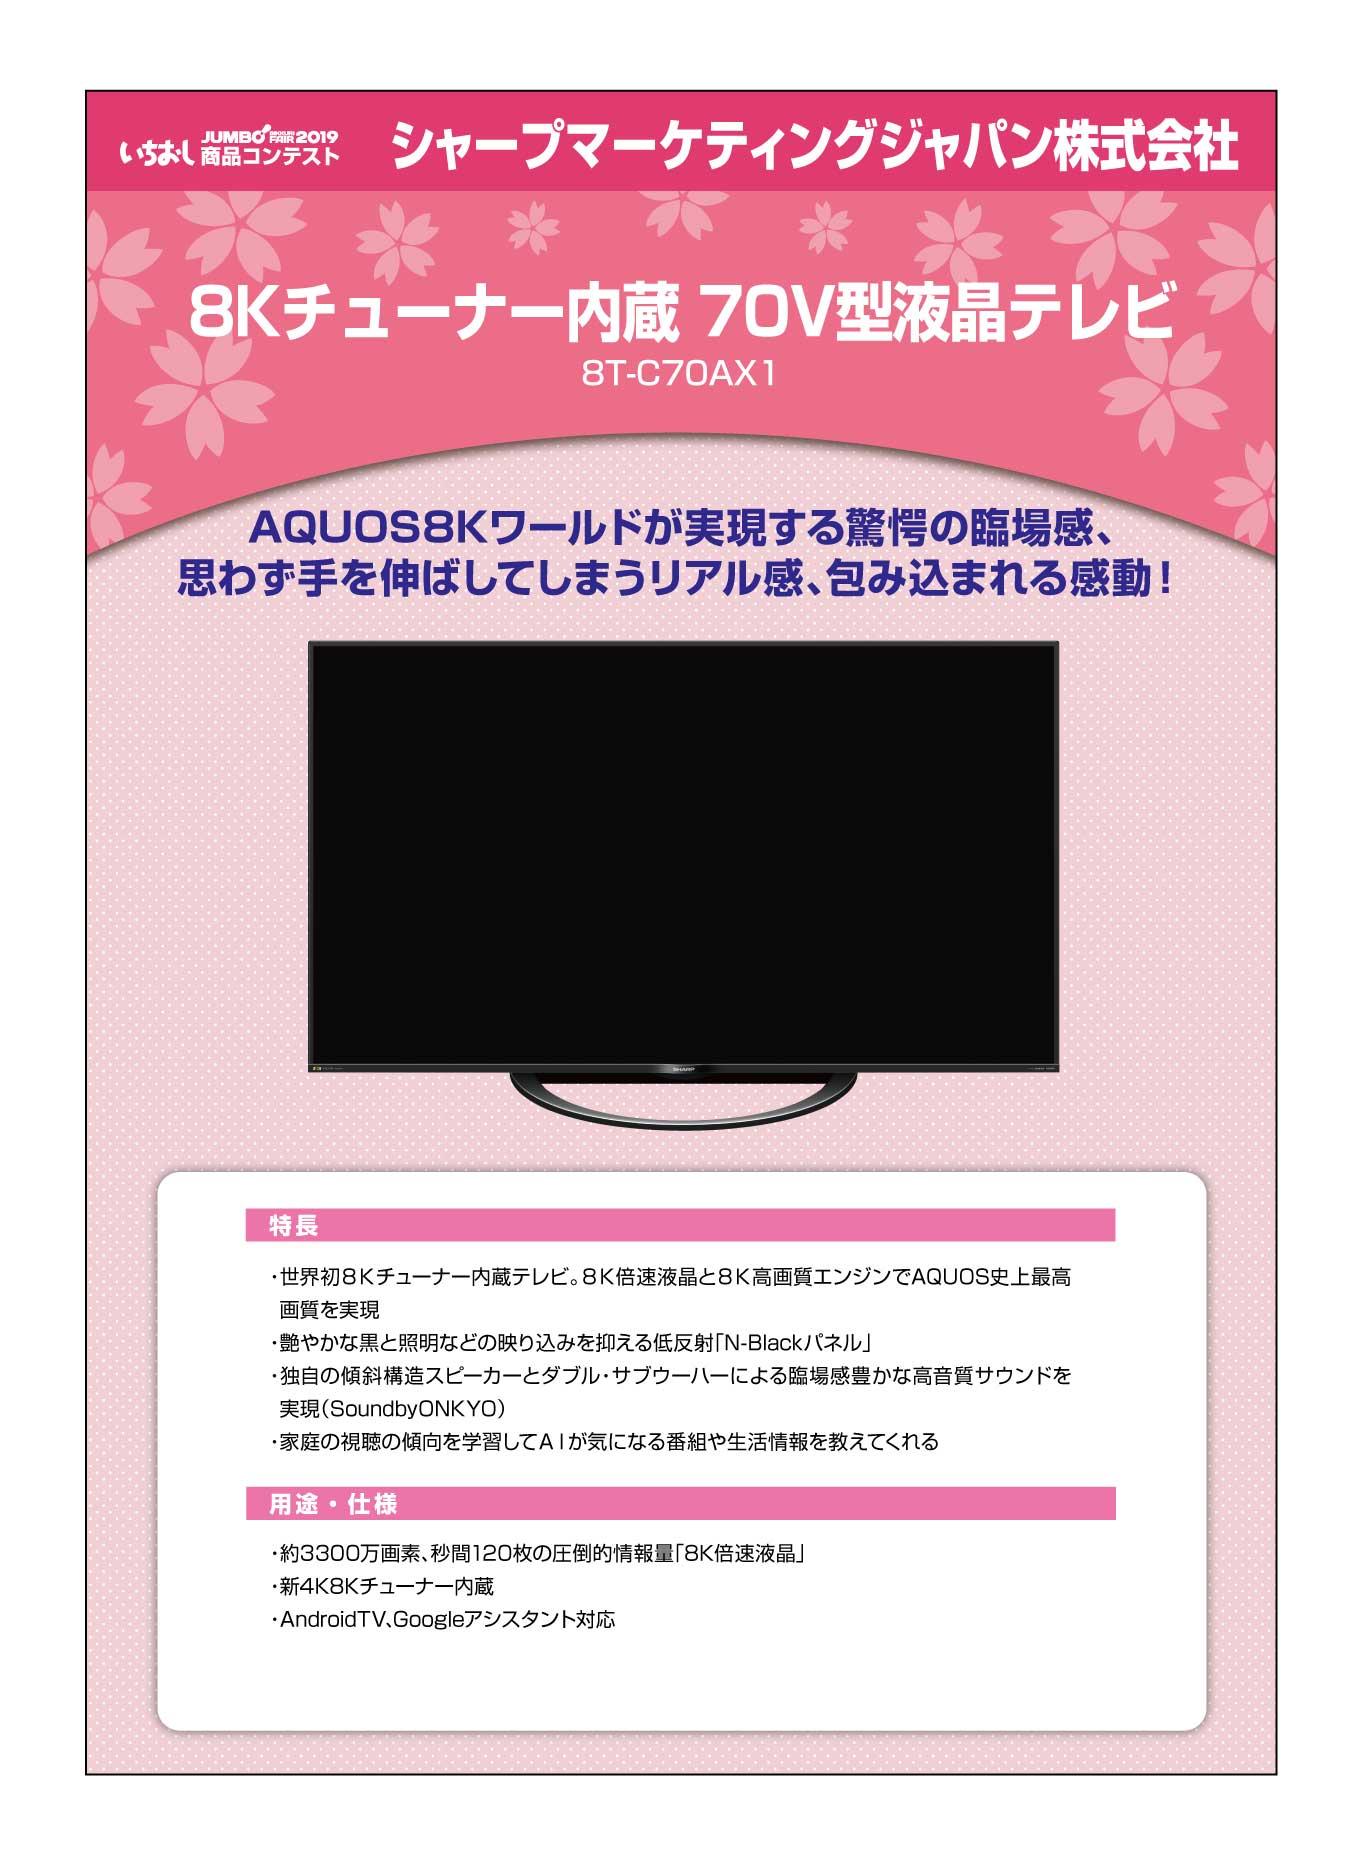 「8Kチューナー内蔵 70V型液晶テレビ」シャープマーケティングジャパン株式会社の画像